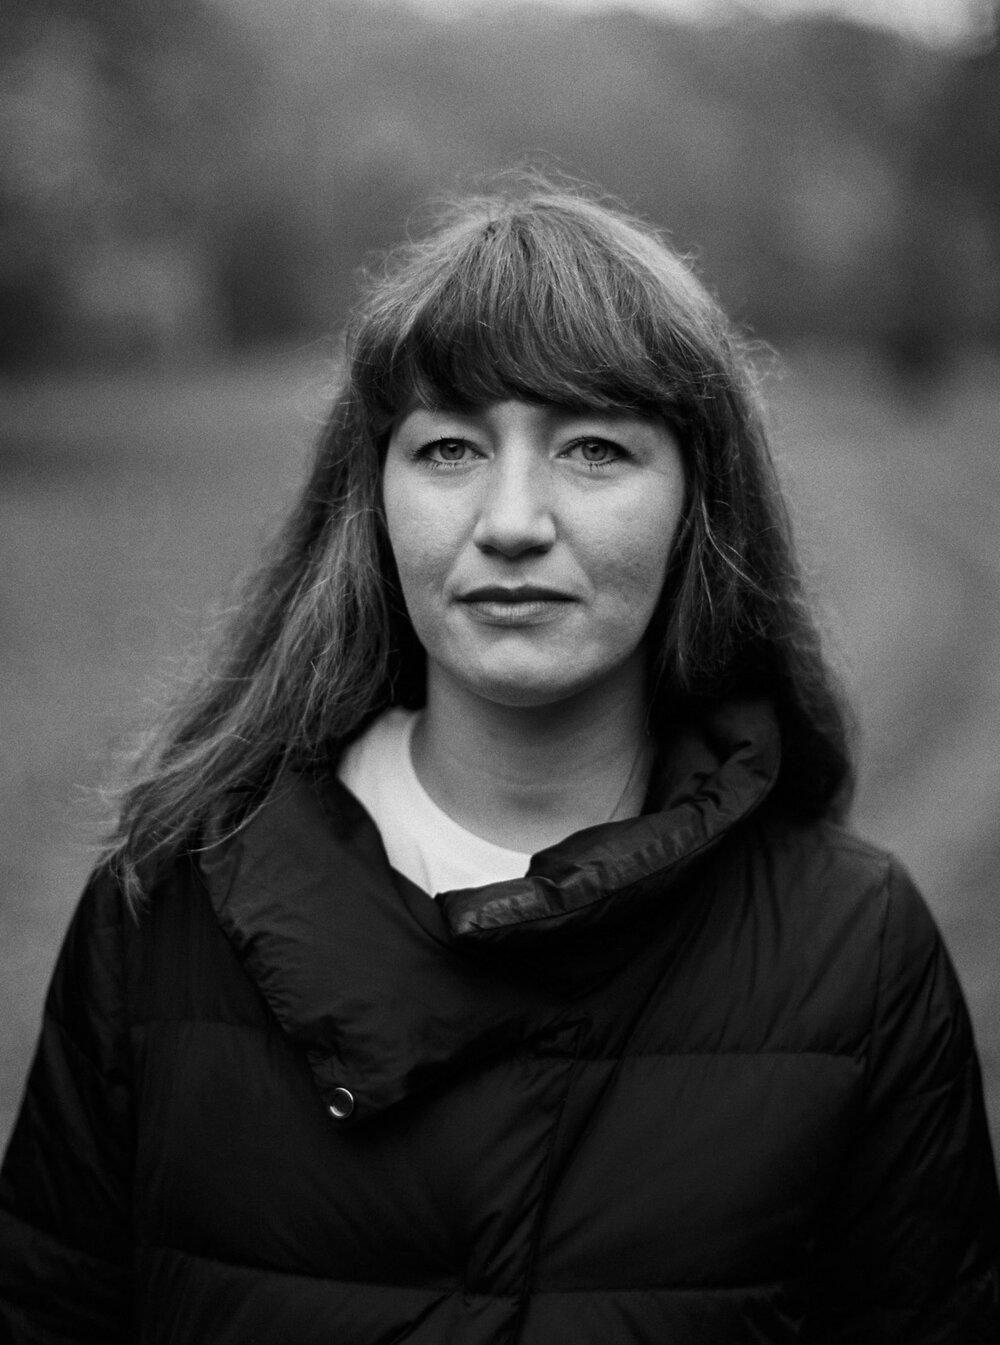 Tamara, Photographer